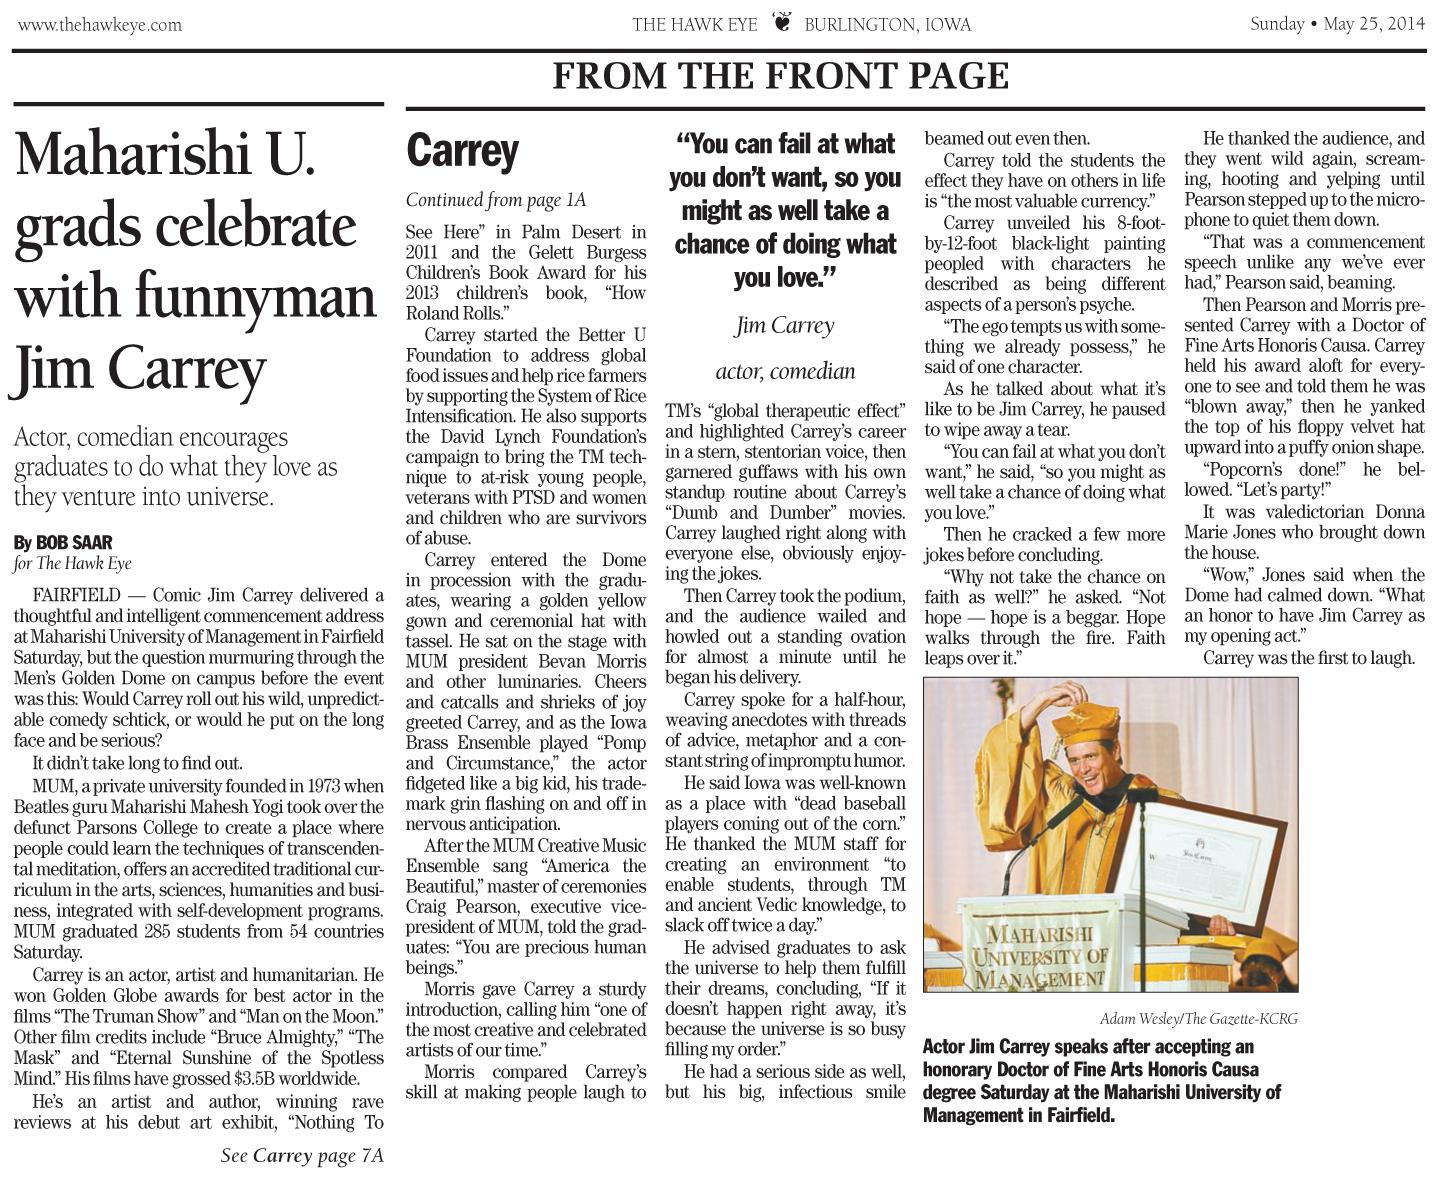 Maharishi U. grads celebrate with funnyman Jim Carrey